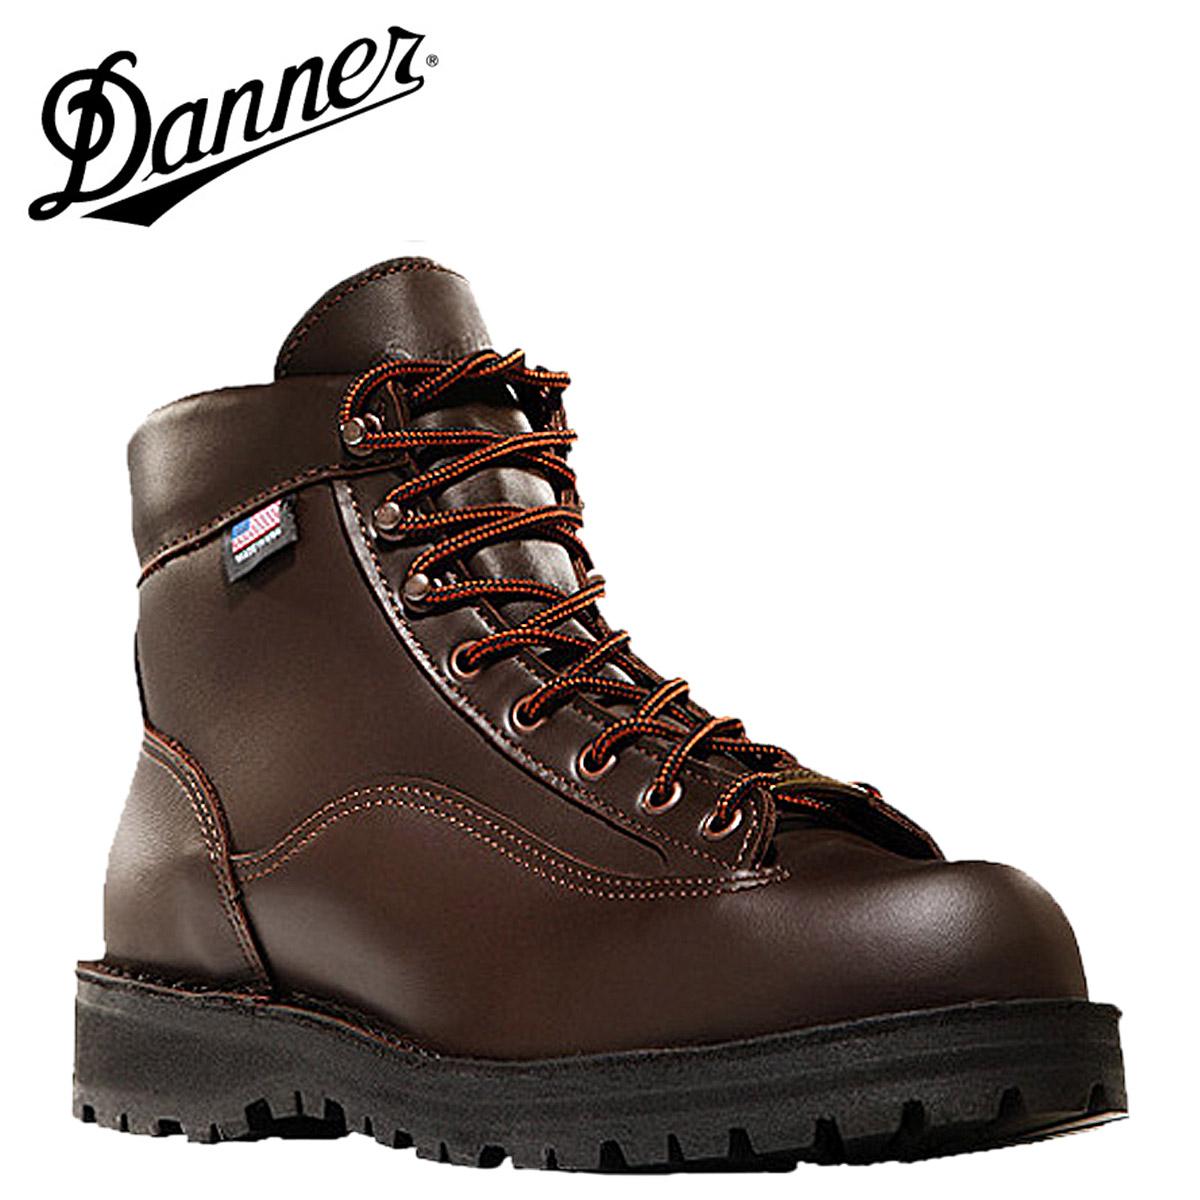 ALLSPORTS | Rakuten Global Market: [SOLD OUT] Danner Danner ...